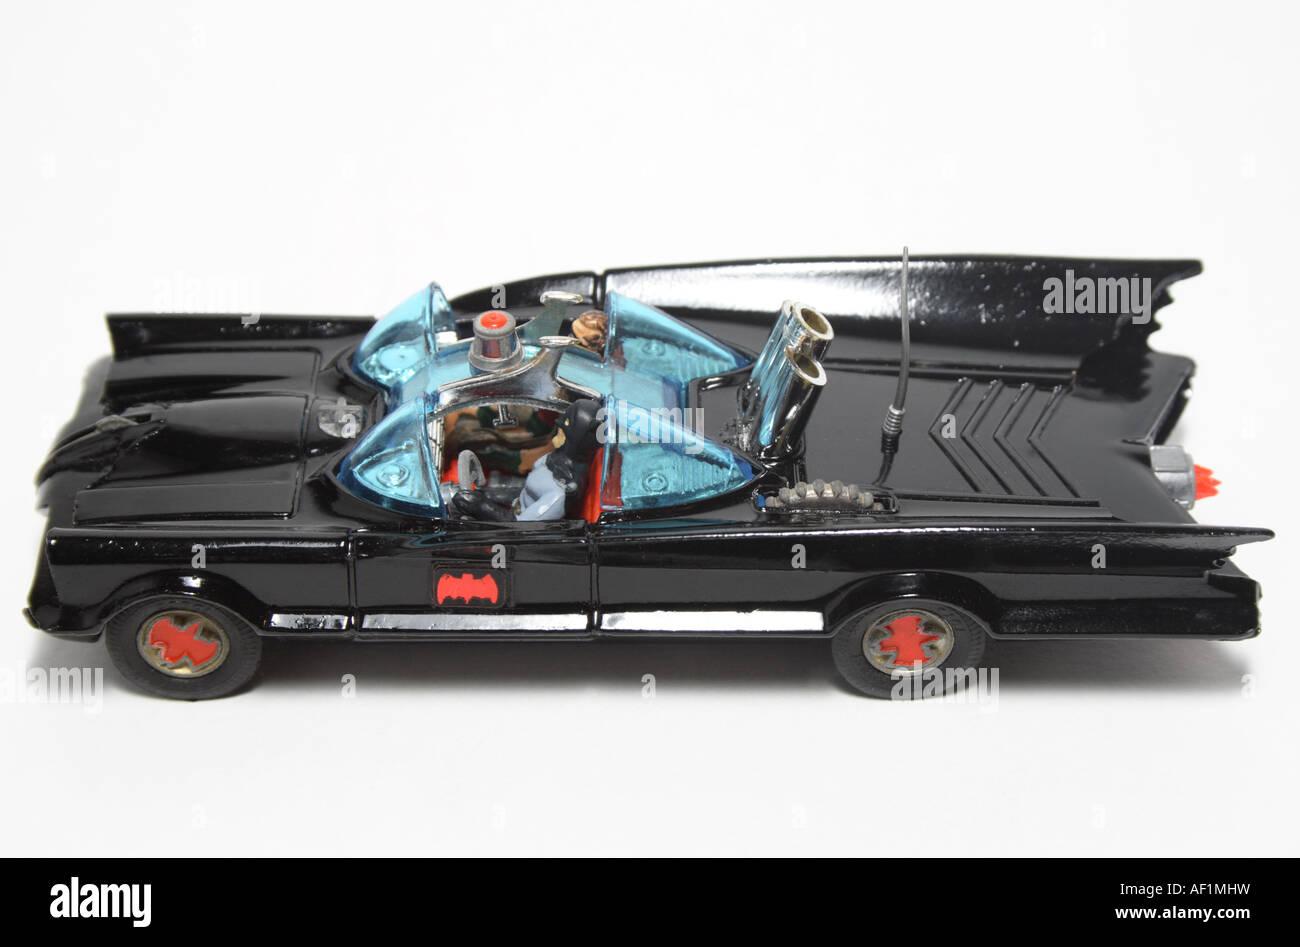 Corgi Batmobile Stock Photo: 13802196 - Alamy